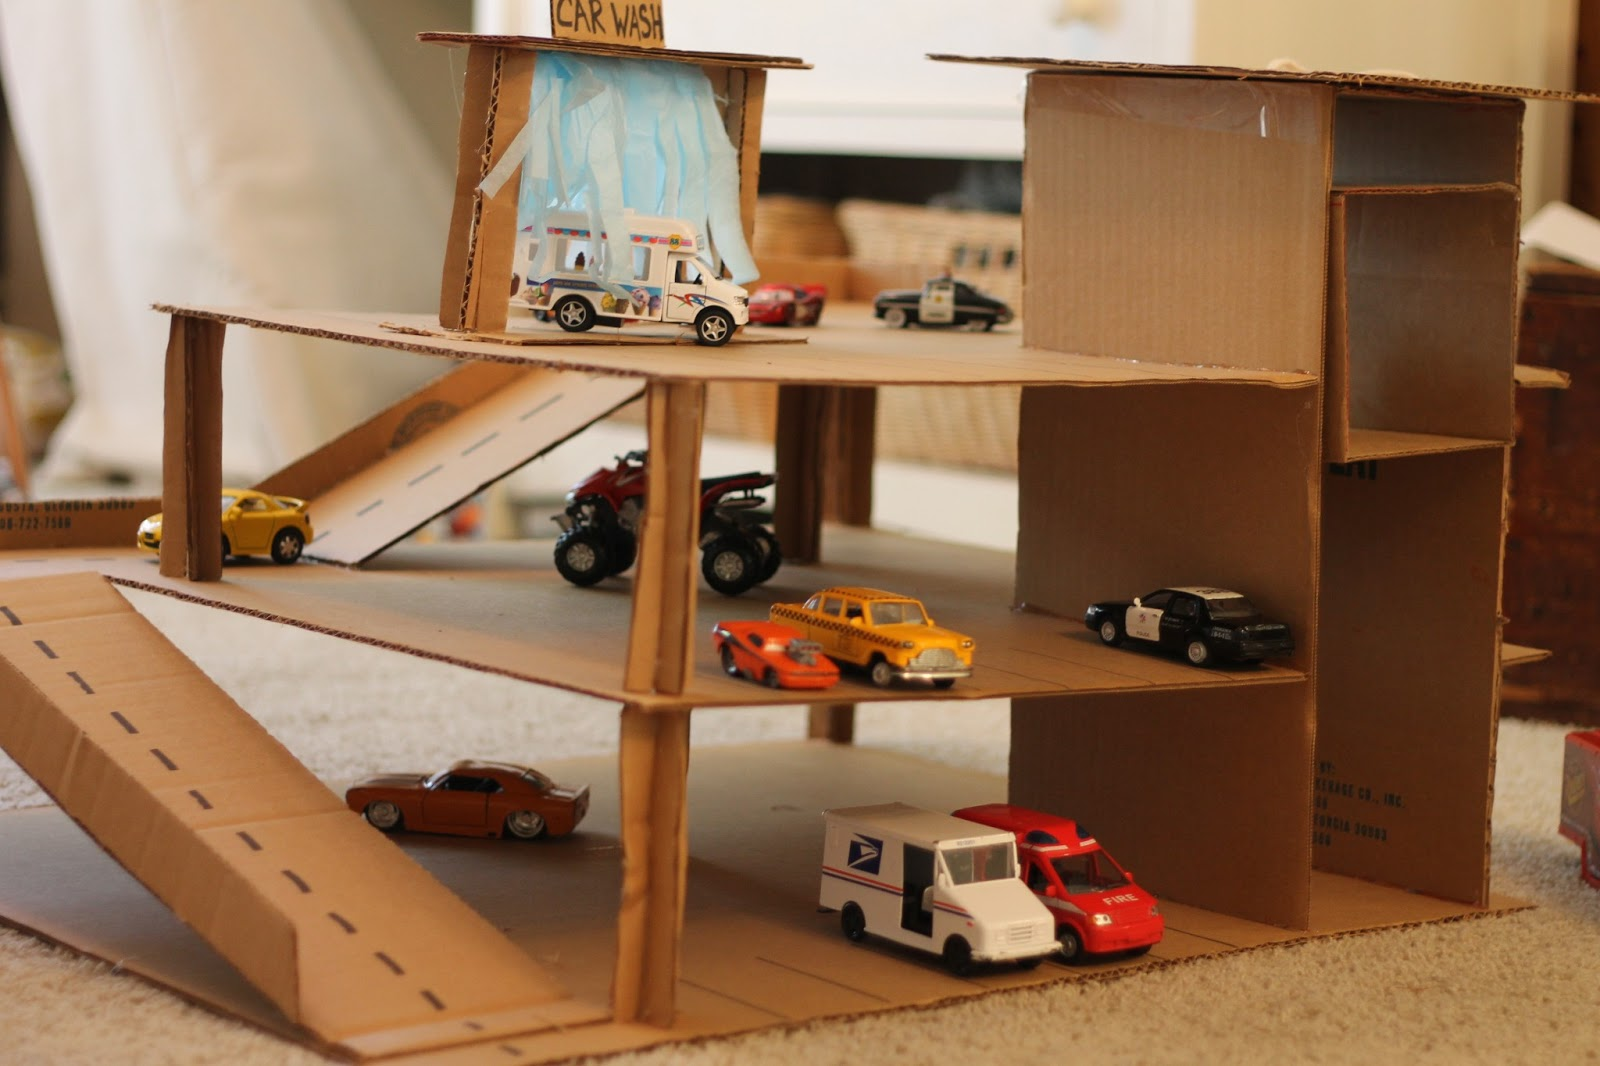 building a new garage ideas - All Things Reintjes A Little Cardboard Constructing